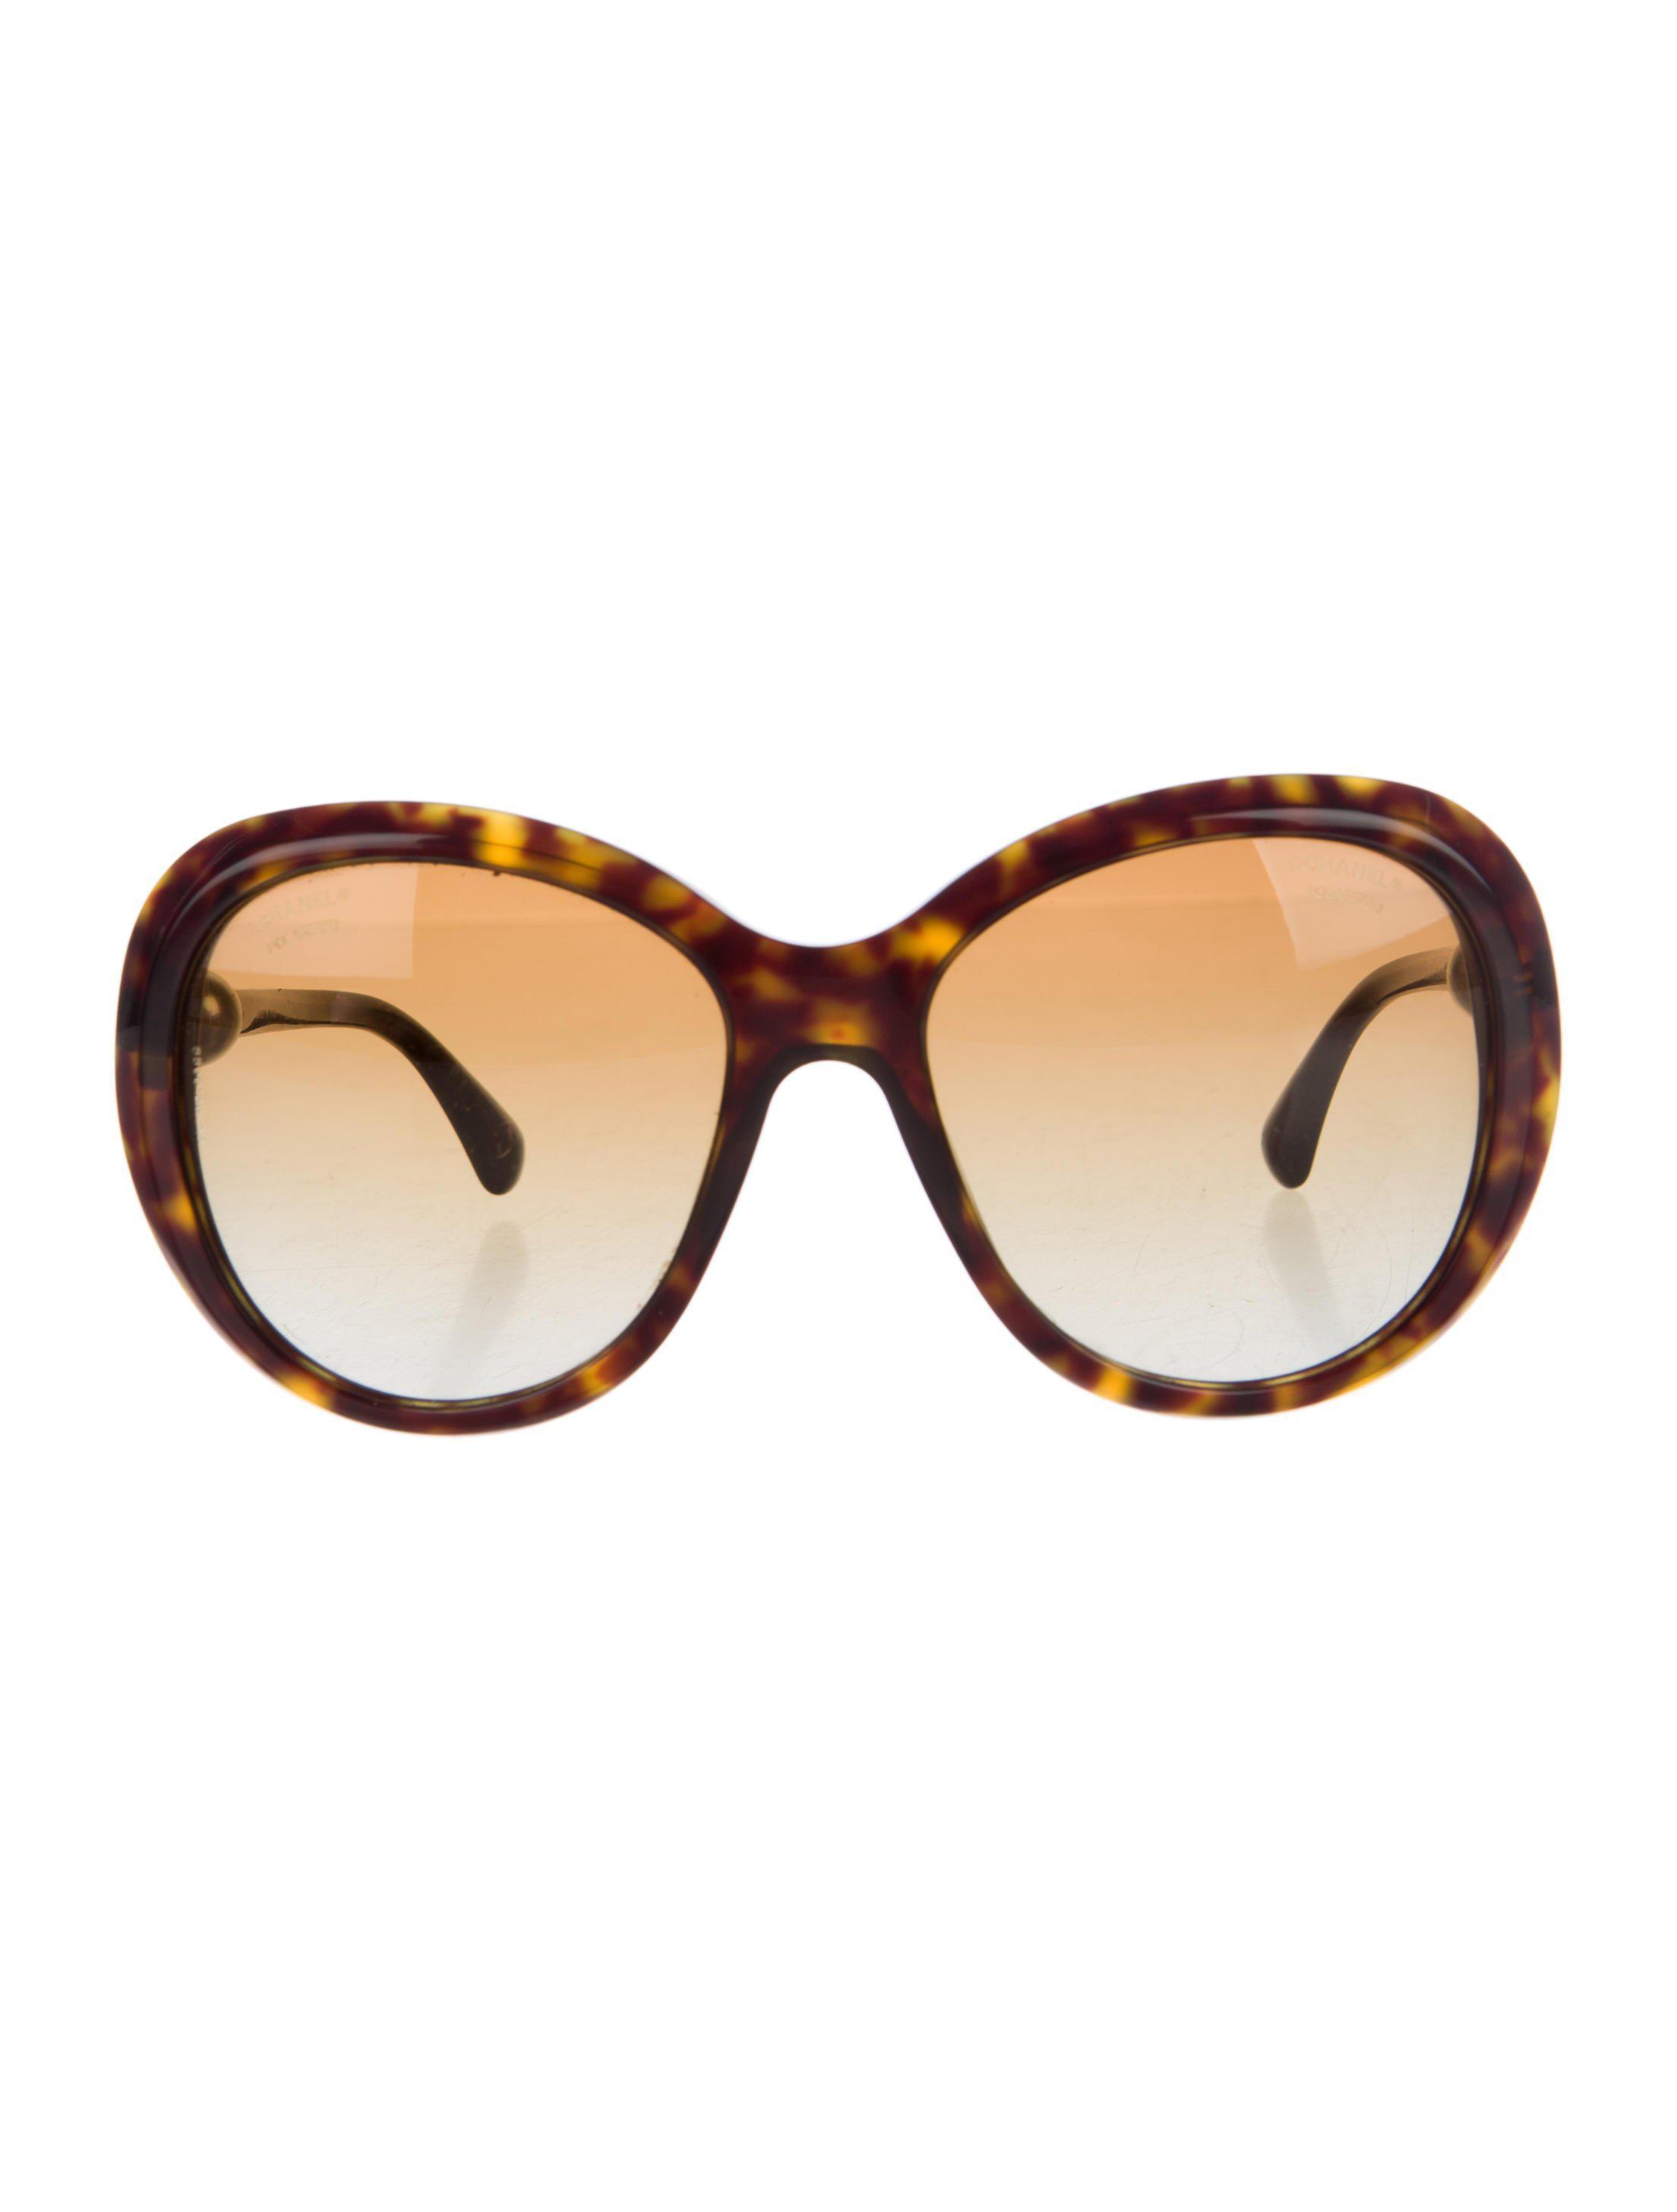 68d8e0a42e853 Lyst - Chanel Oversized Pearl Sunglasses Brown in Metallic